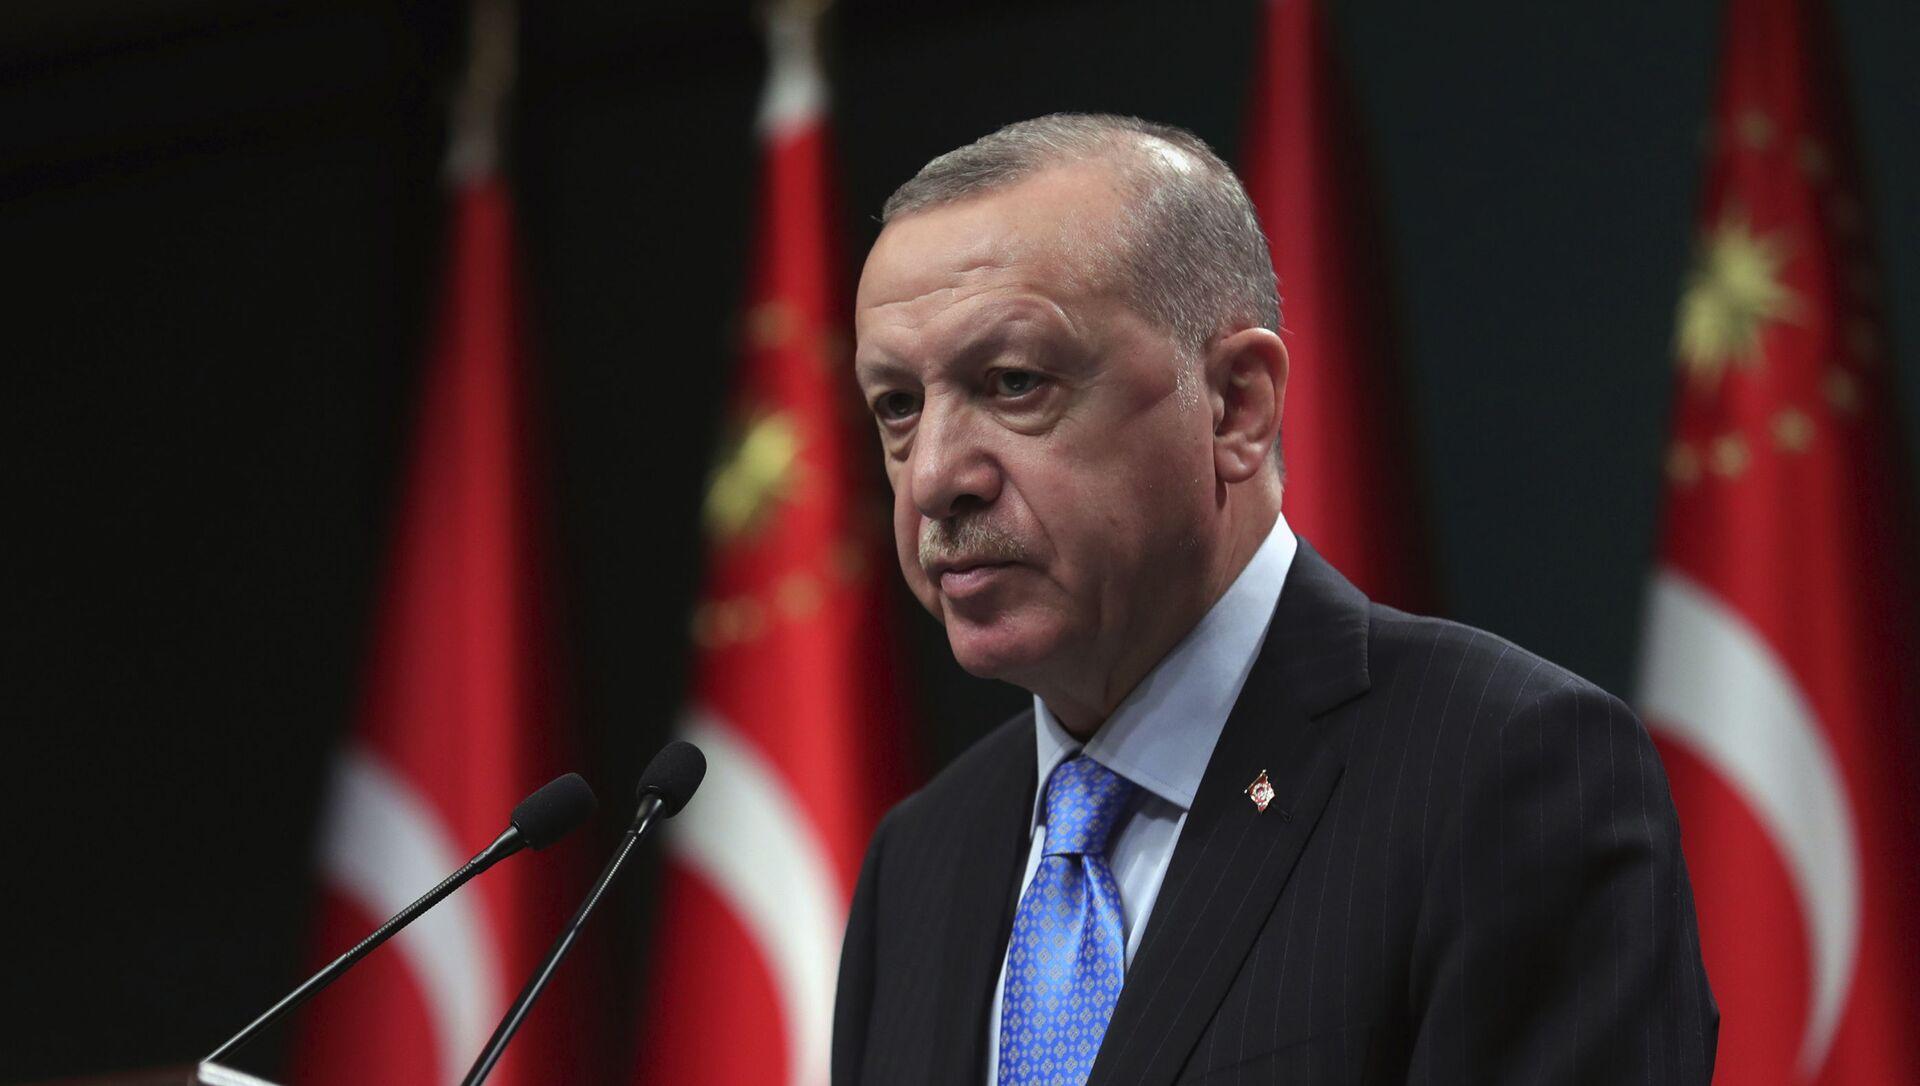 Президент Турции Реджеп Тайип Эрдоган, фото из архива - Sputnik Азербайджан, 1920, 20.02.2021